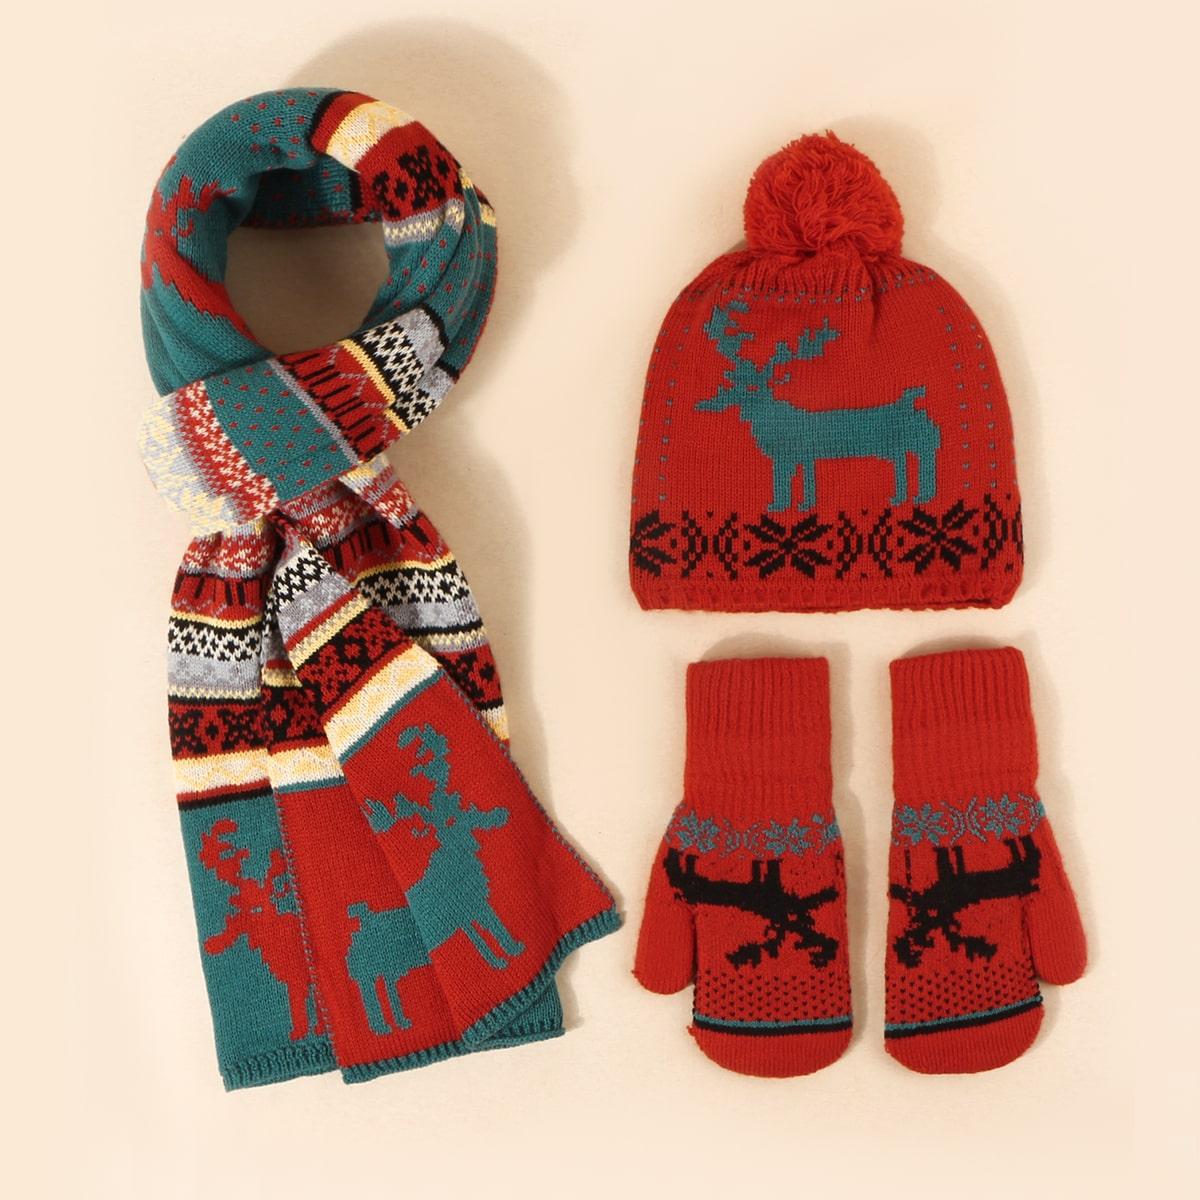 Перчатки, шарф и шапка с рождественским рисунком